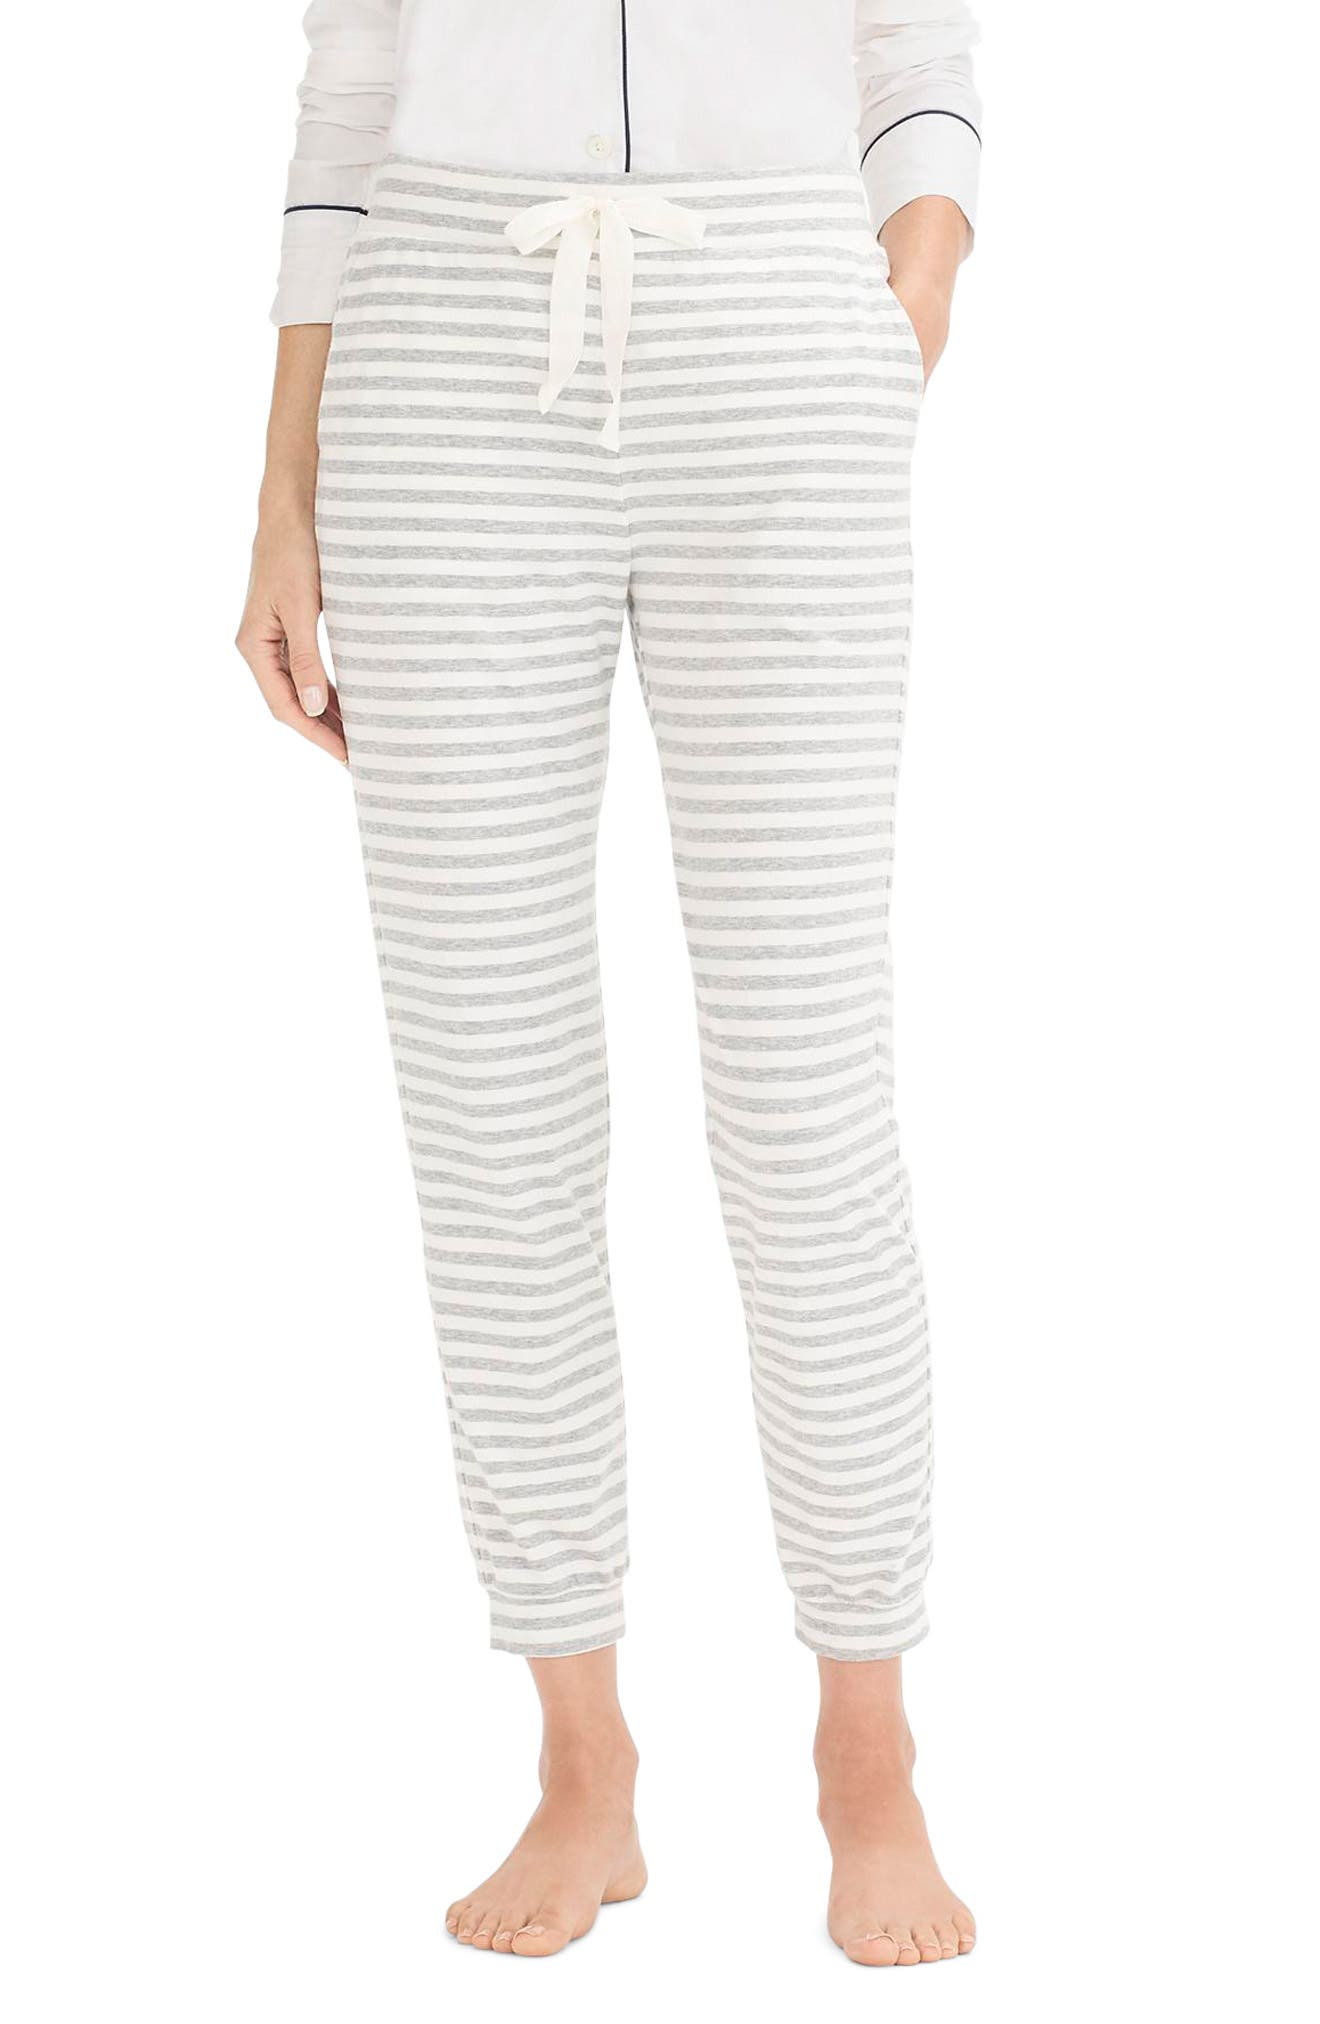 J.crew Dreamy Stripe Pajama Jogger Pants, Grey